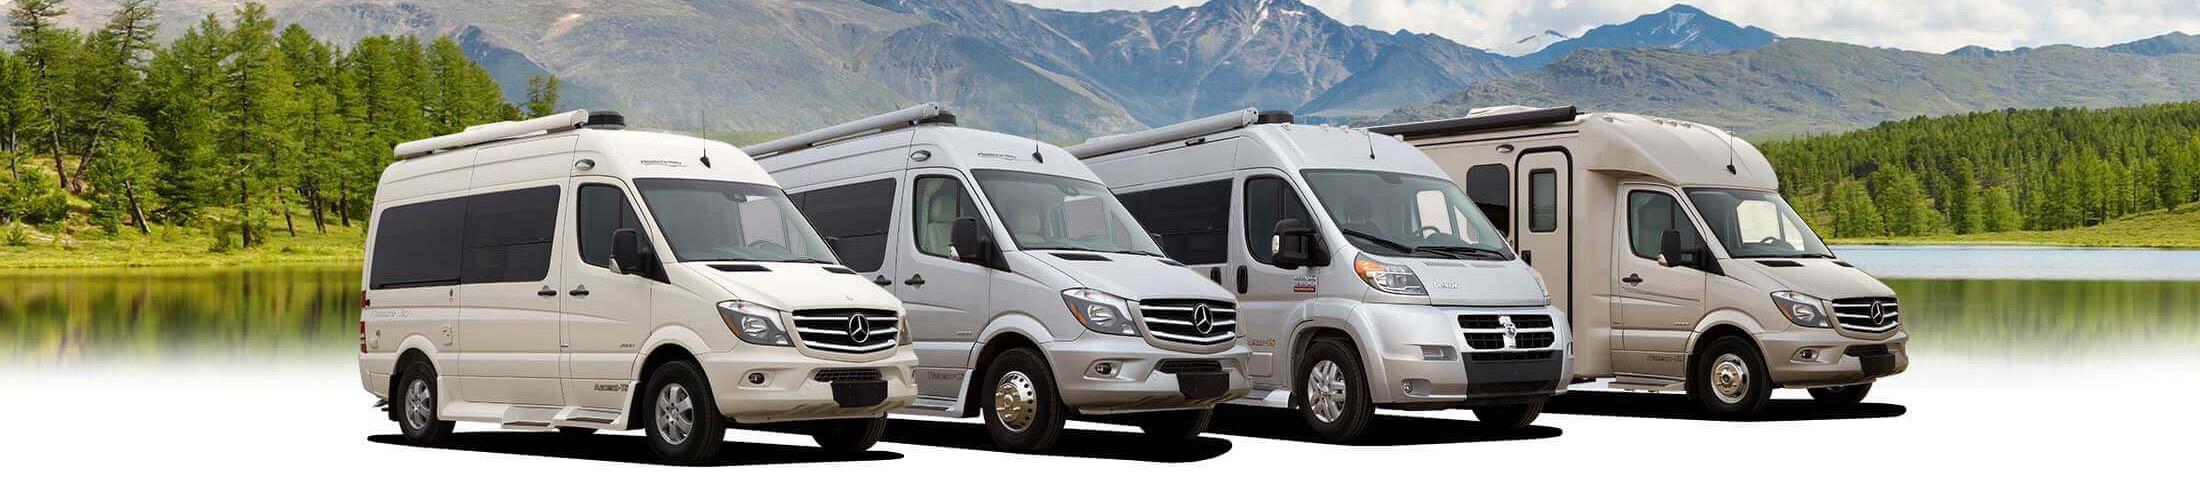 Camper Vans and Class B Motorhomes